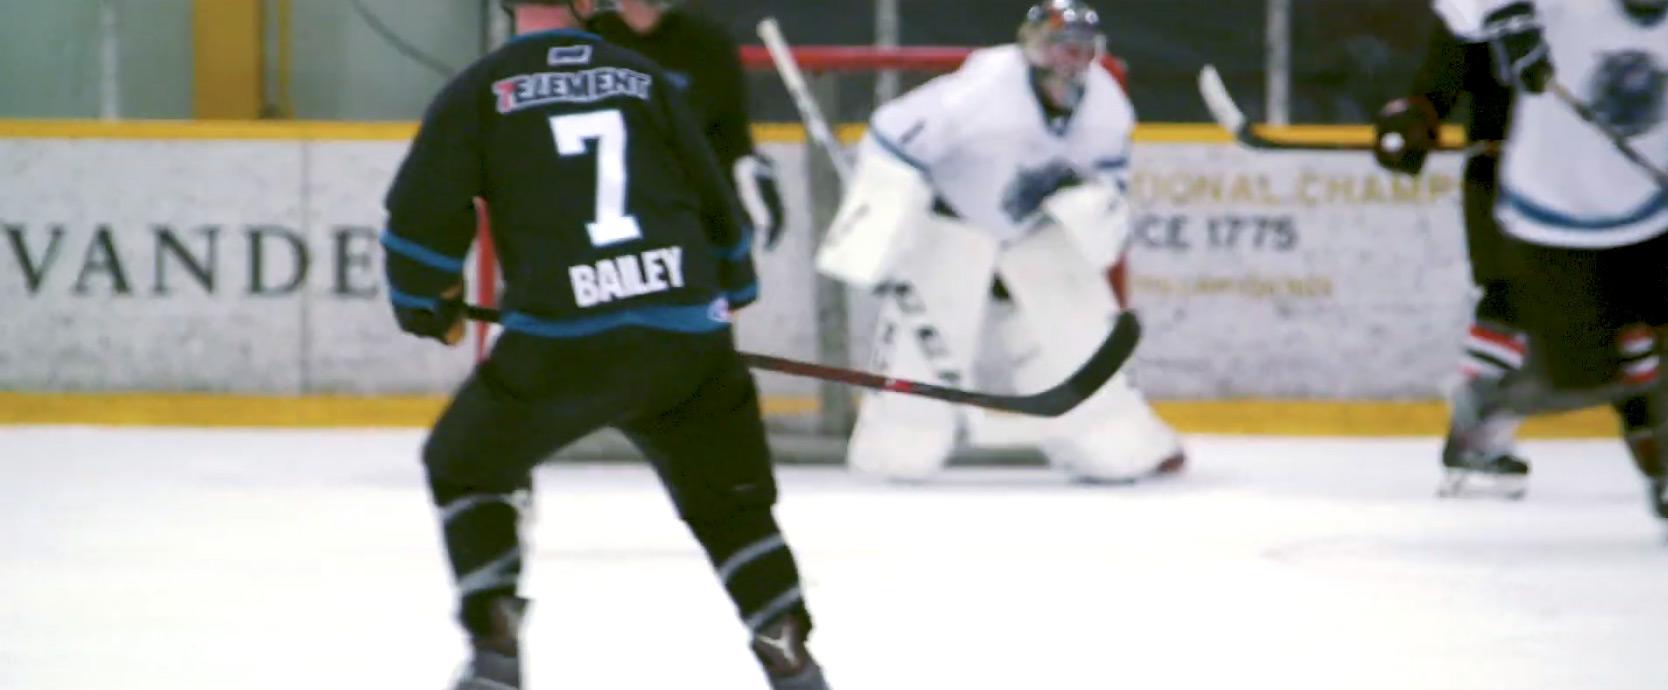 7 Element logo on a hockey jersey